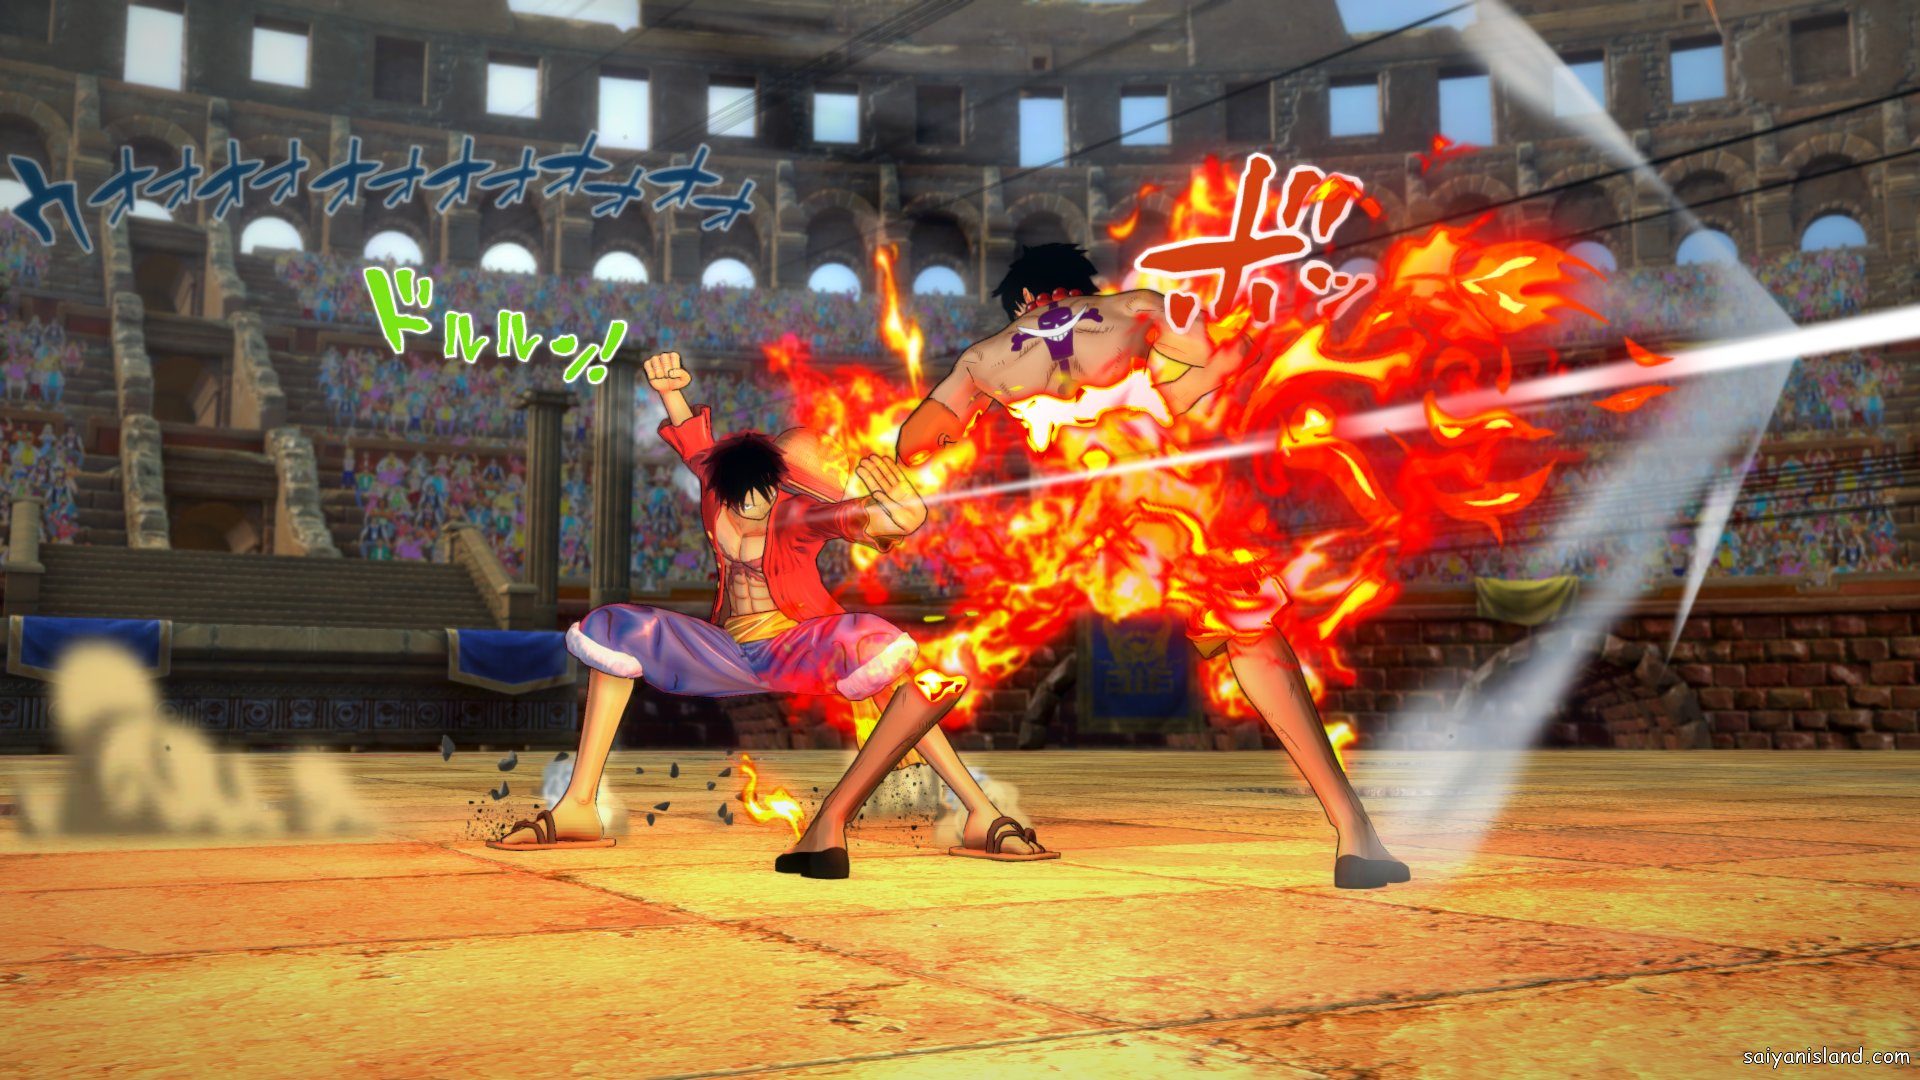 ne Piece: Burning Blood